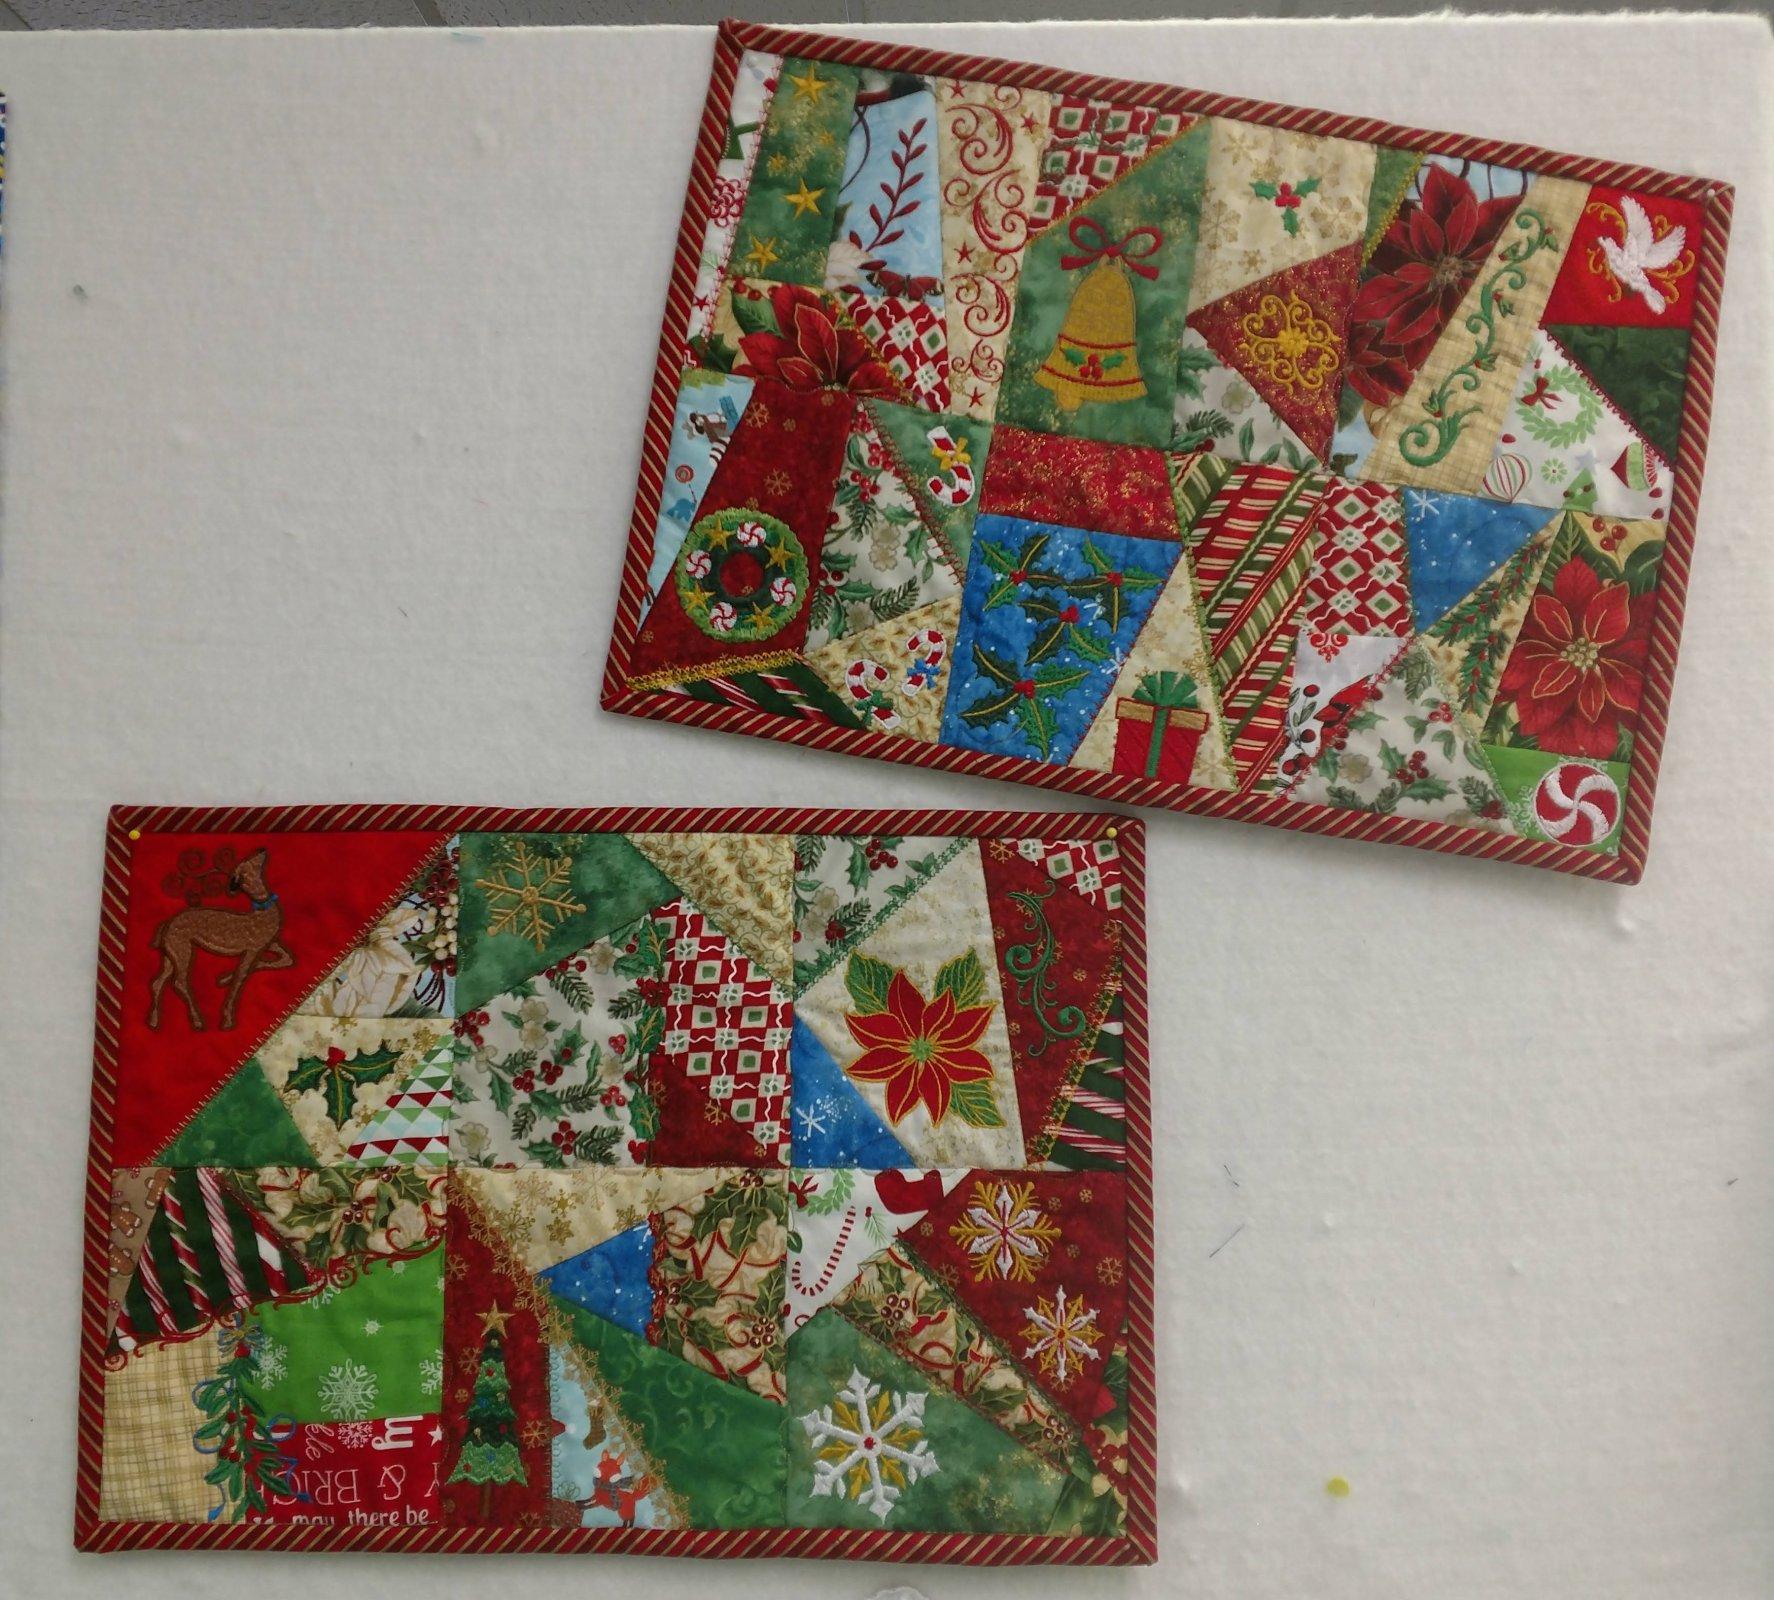 Christmas Crazy Quilt Anita Goodesign